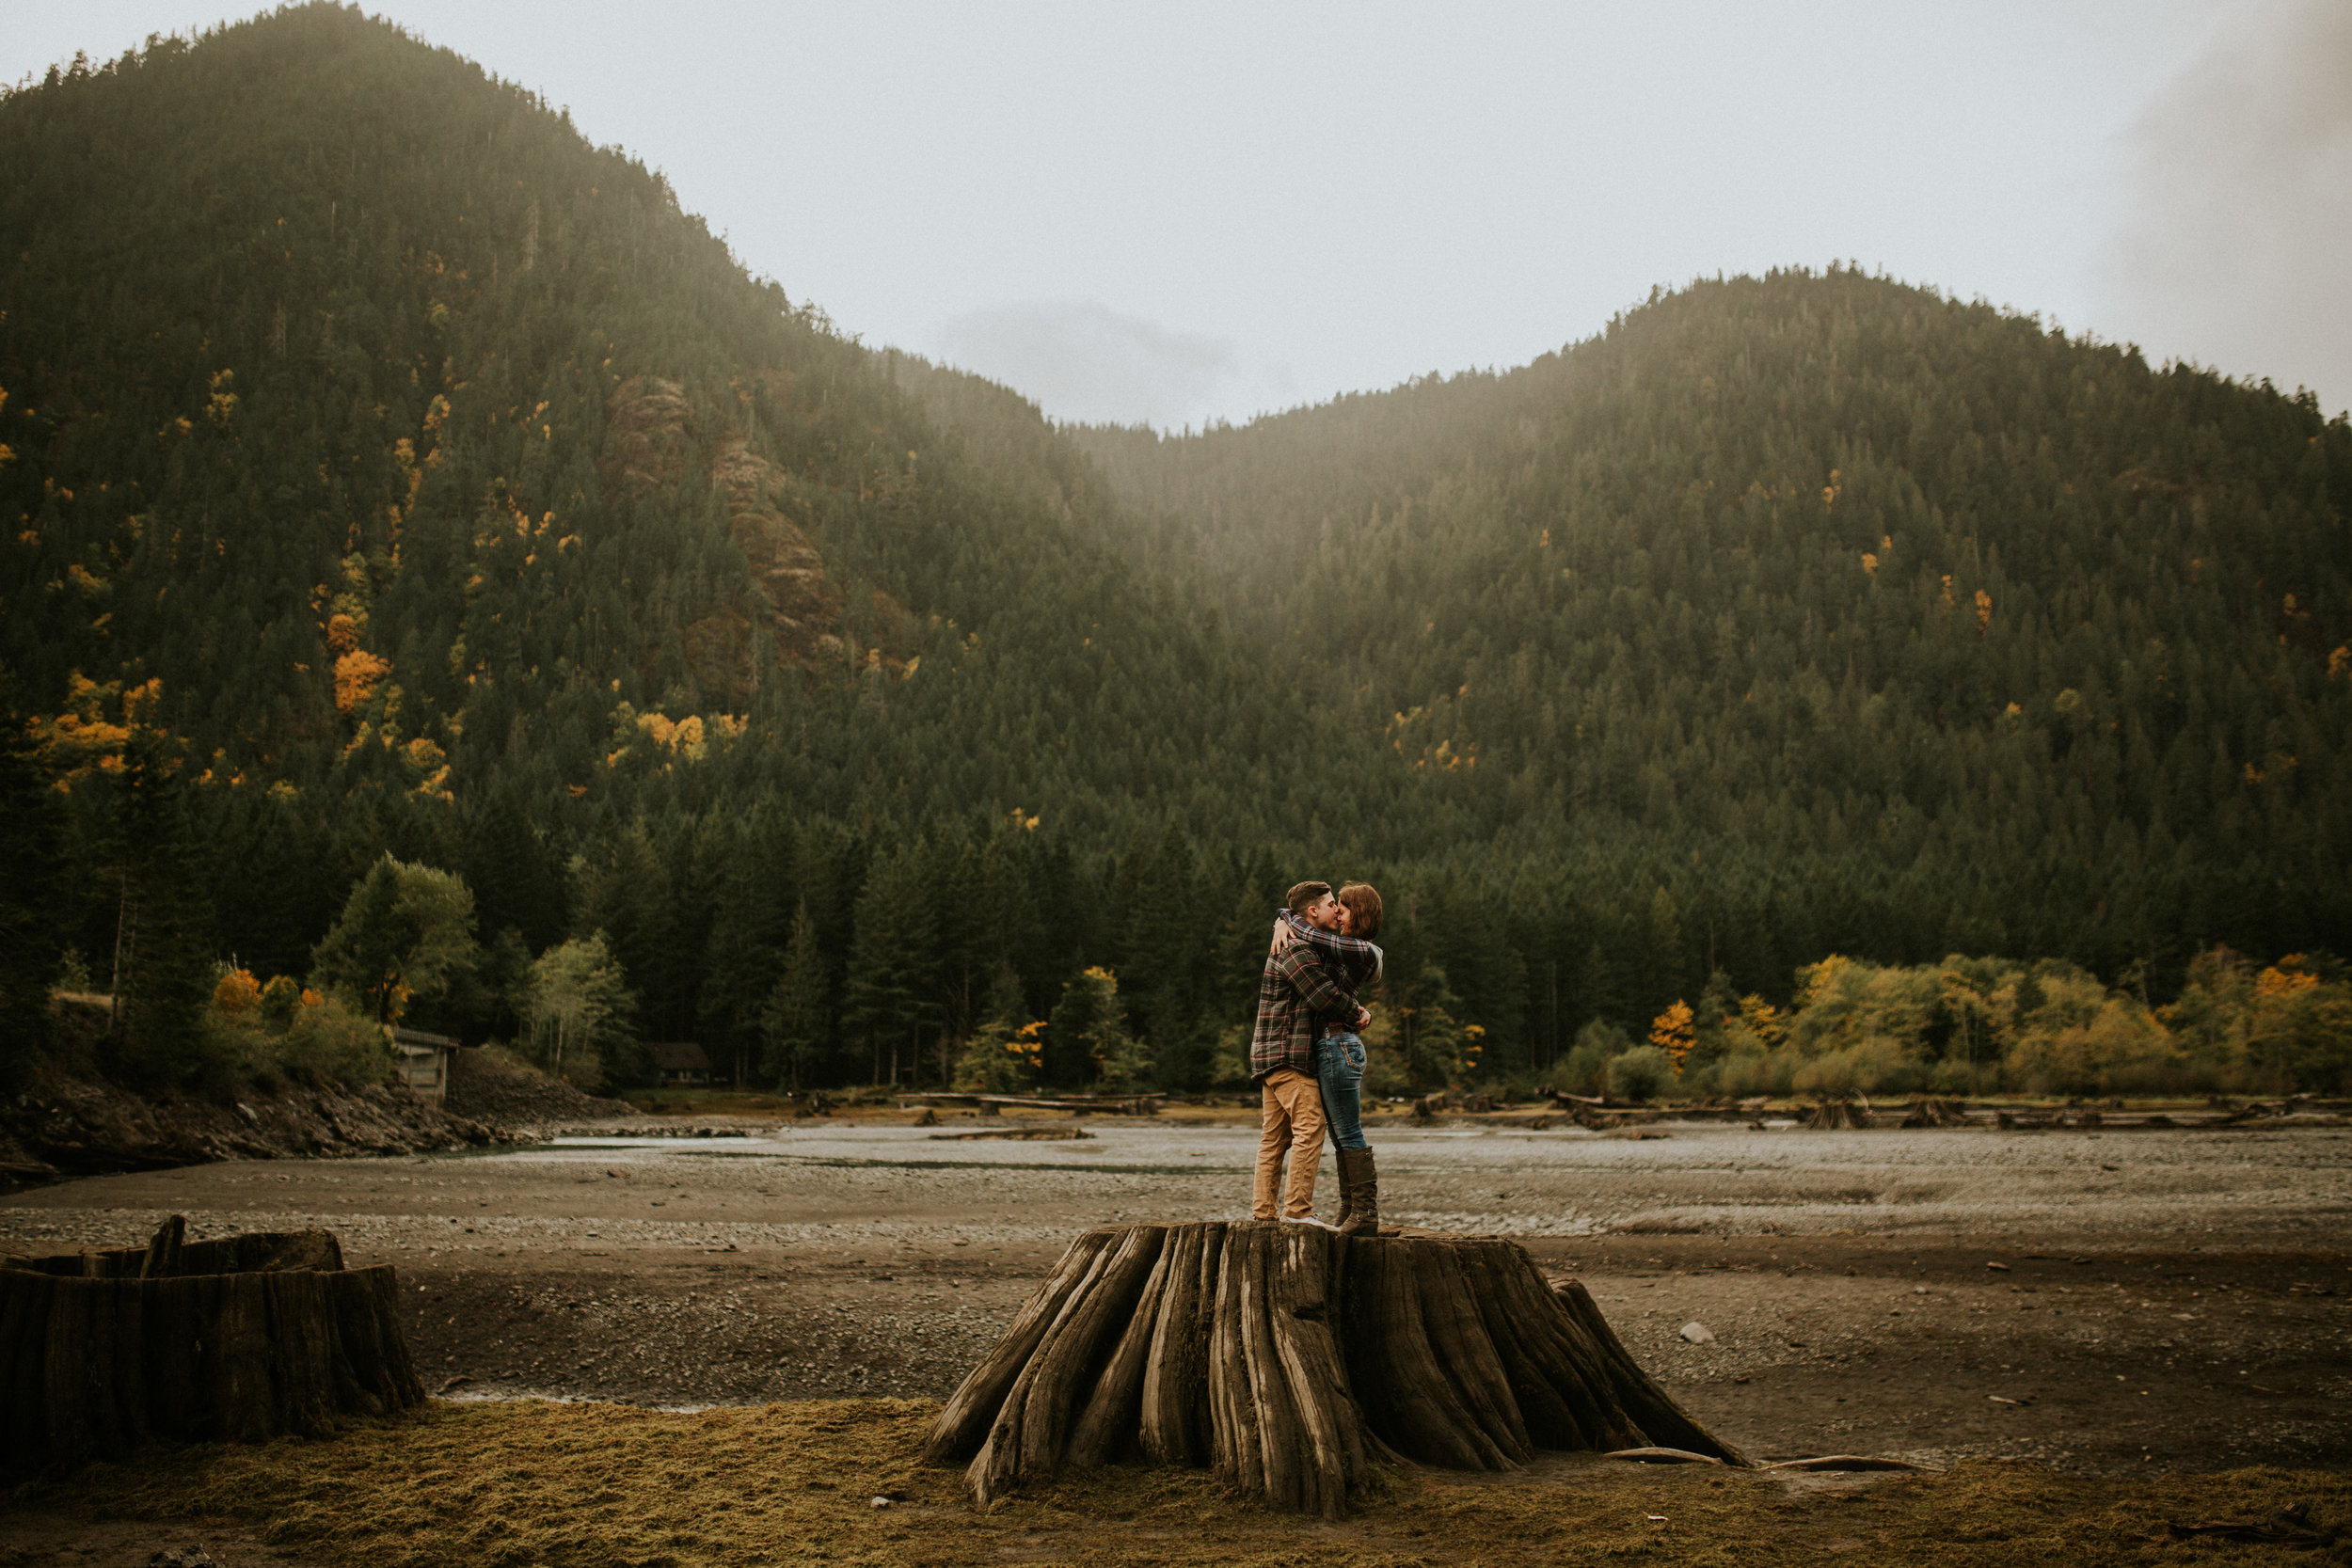 Lake-Cushman-Adventure-Engagement-photographer-breeanna-lasher-18.jpg